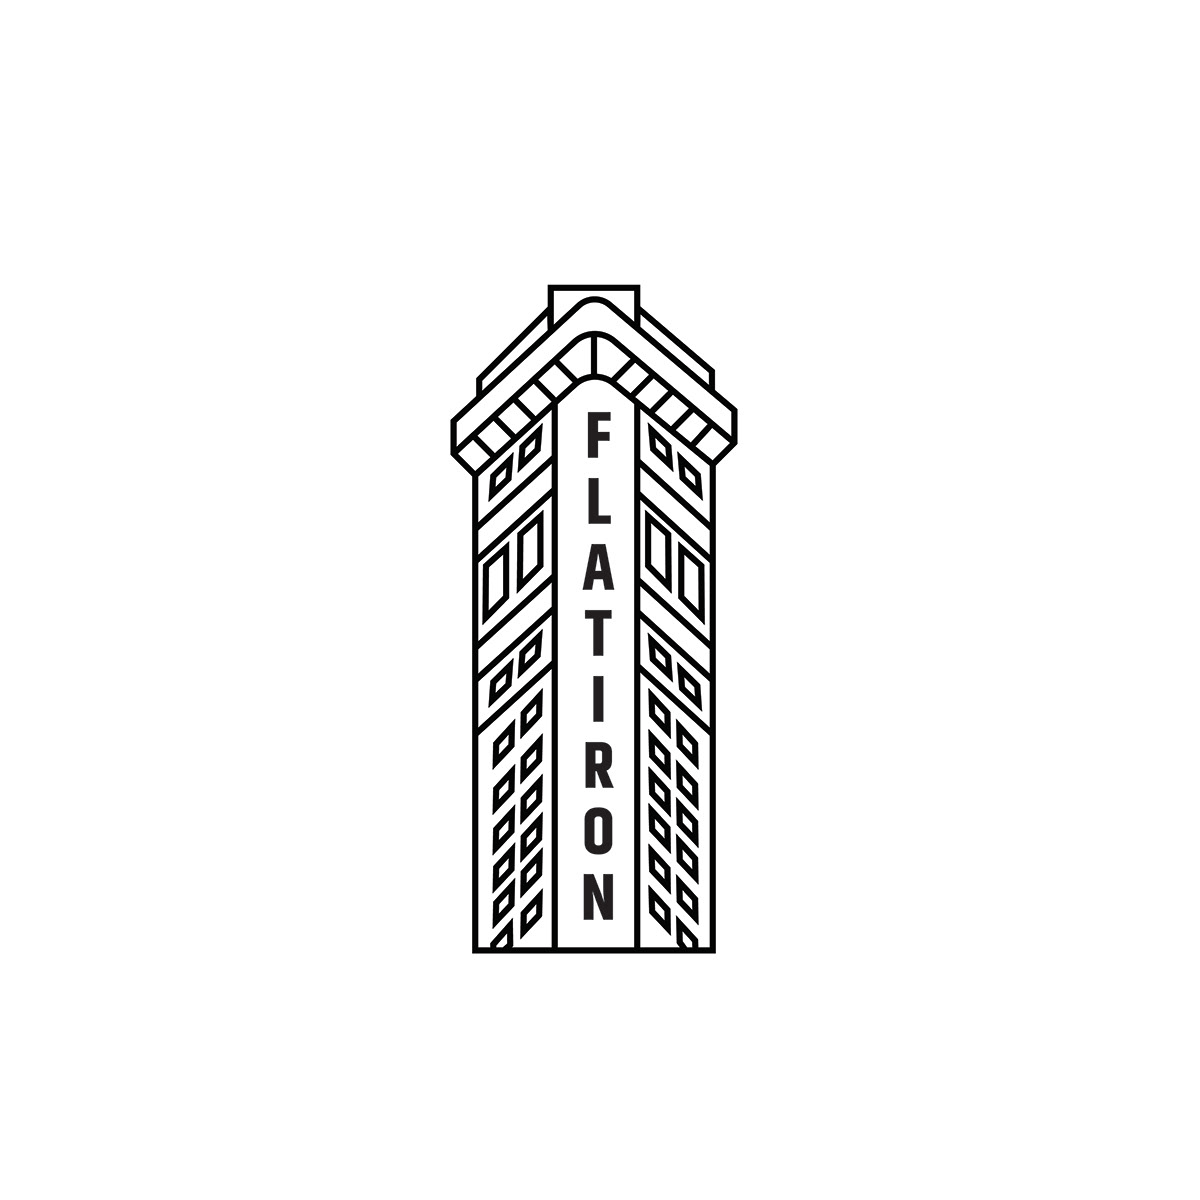 branding  college flatiron graphic design  ILLUSTRATION  Illustrator Manhattan New York nyc photoshop